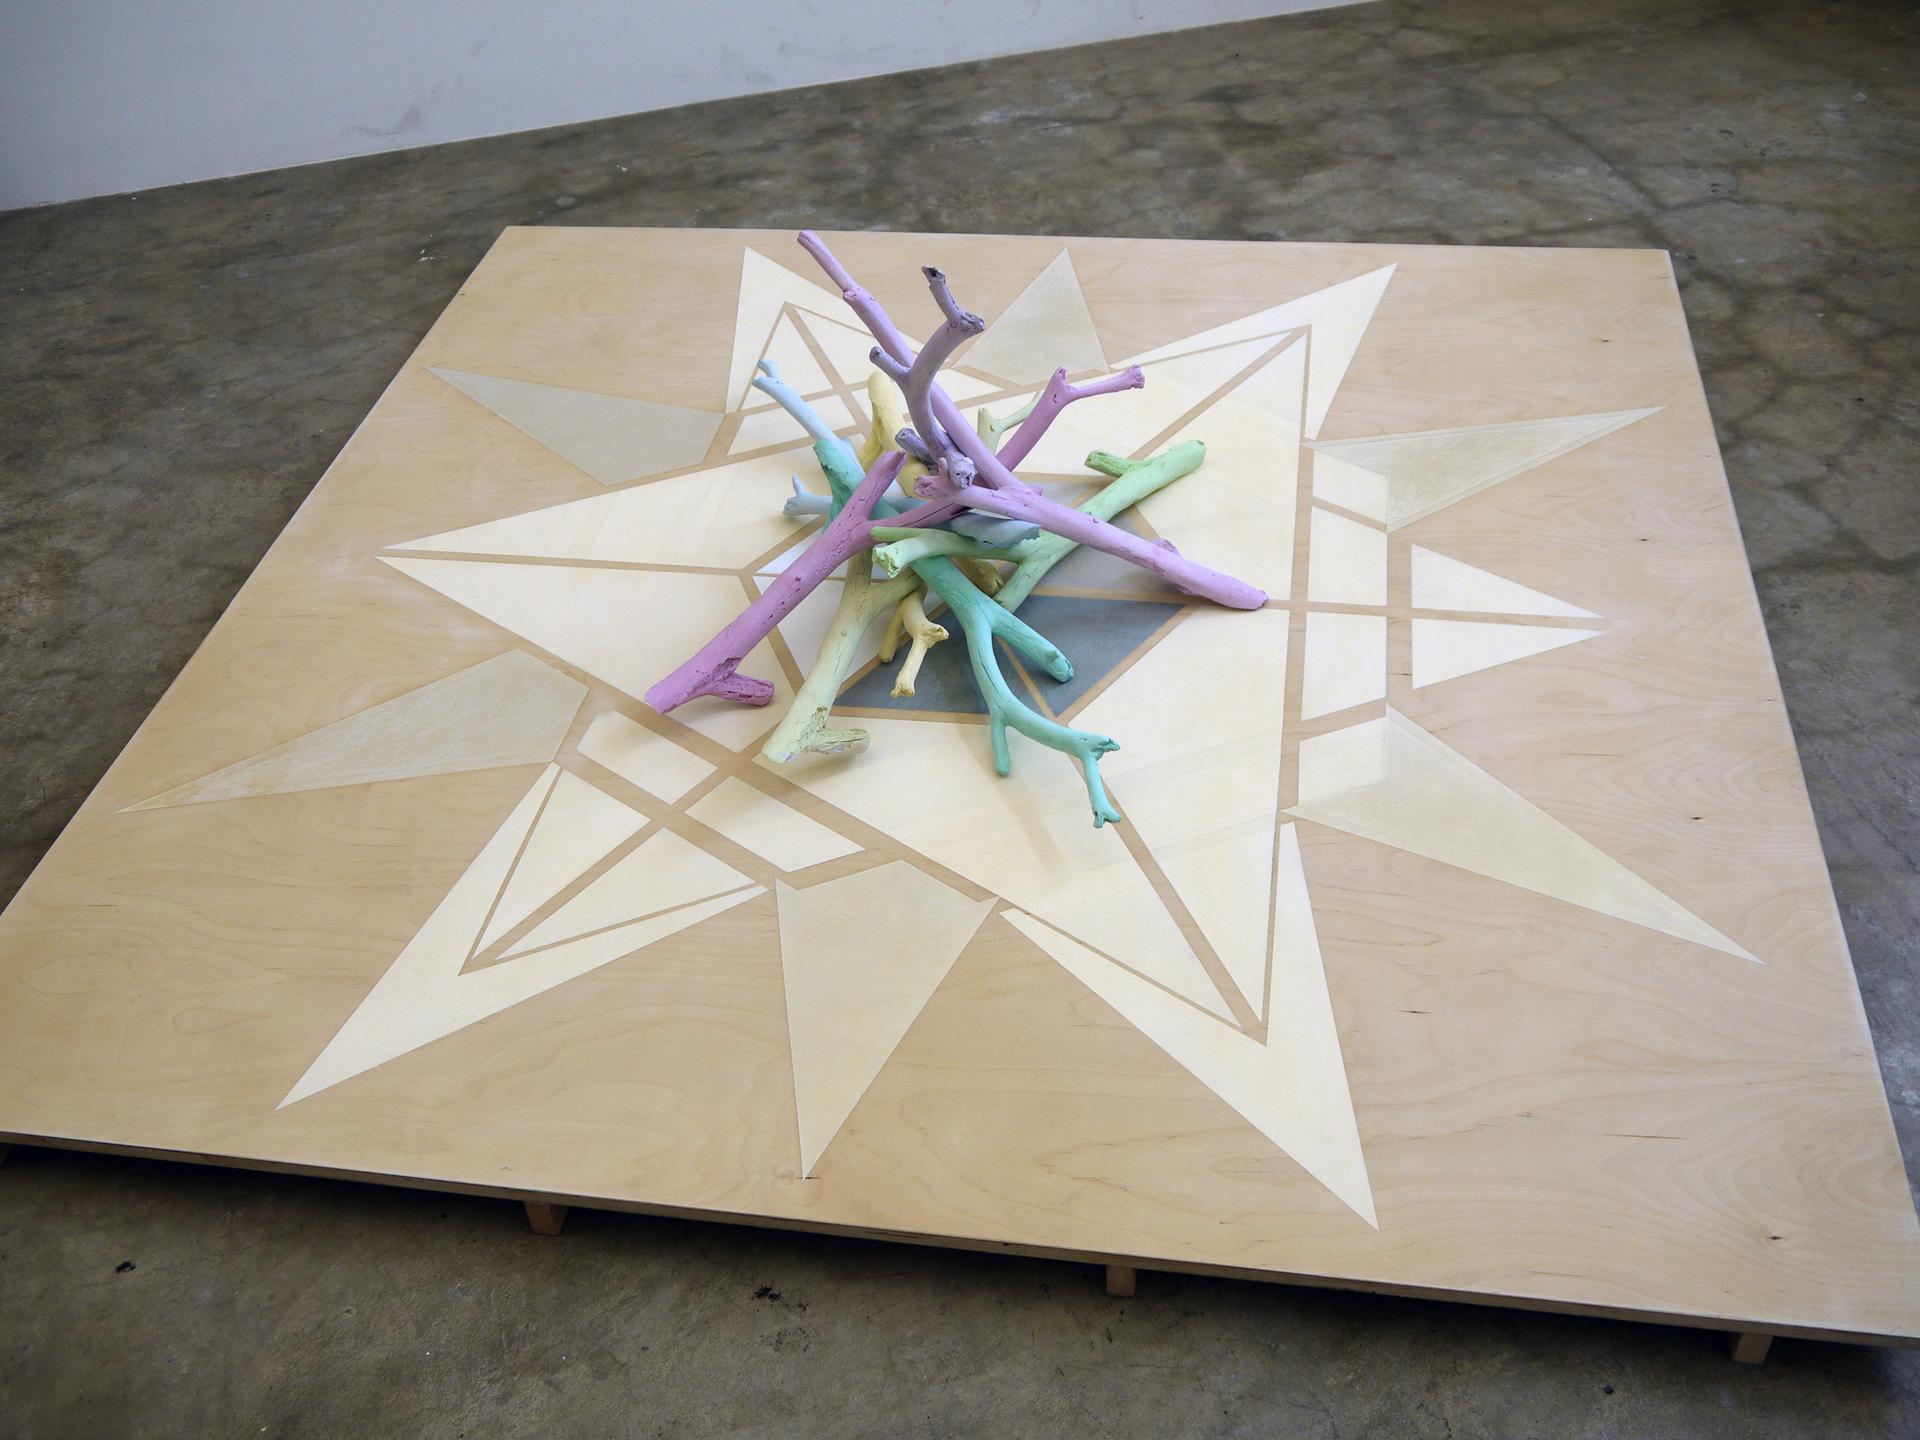 Dodekagramfloor painting & Bundle of sticks